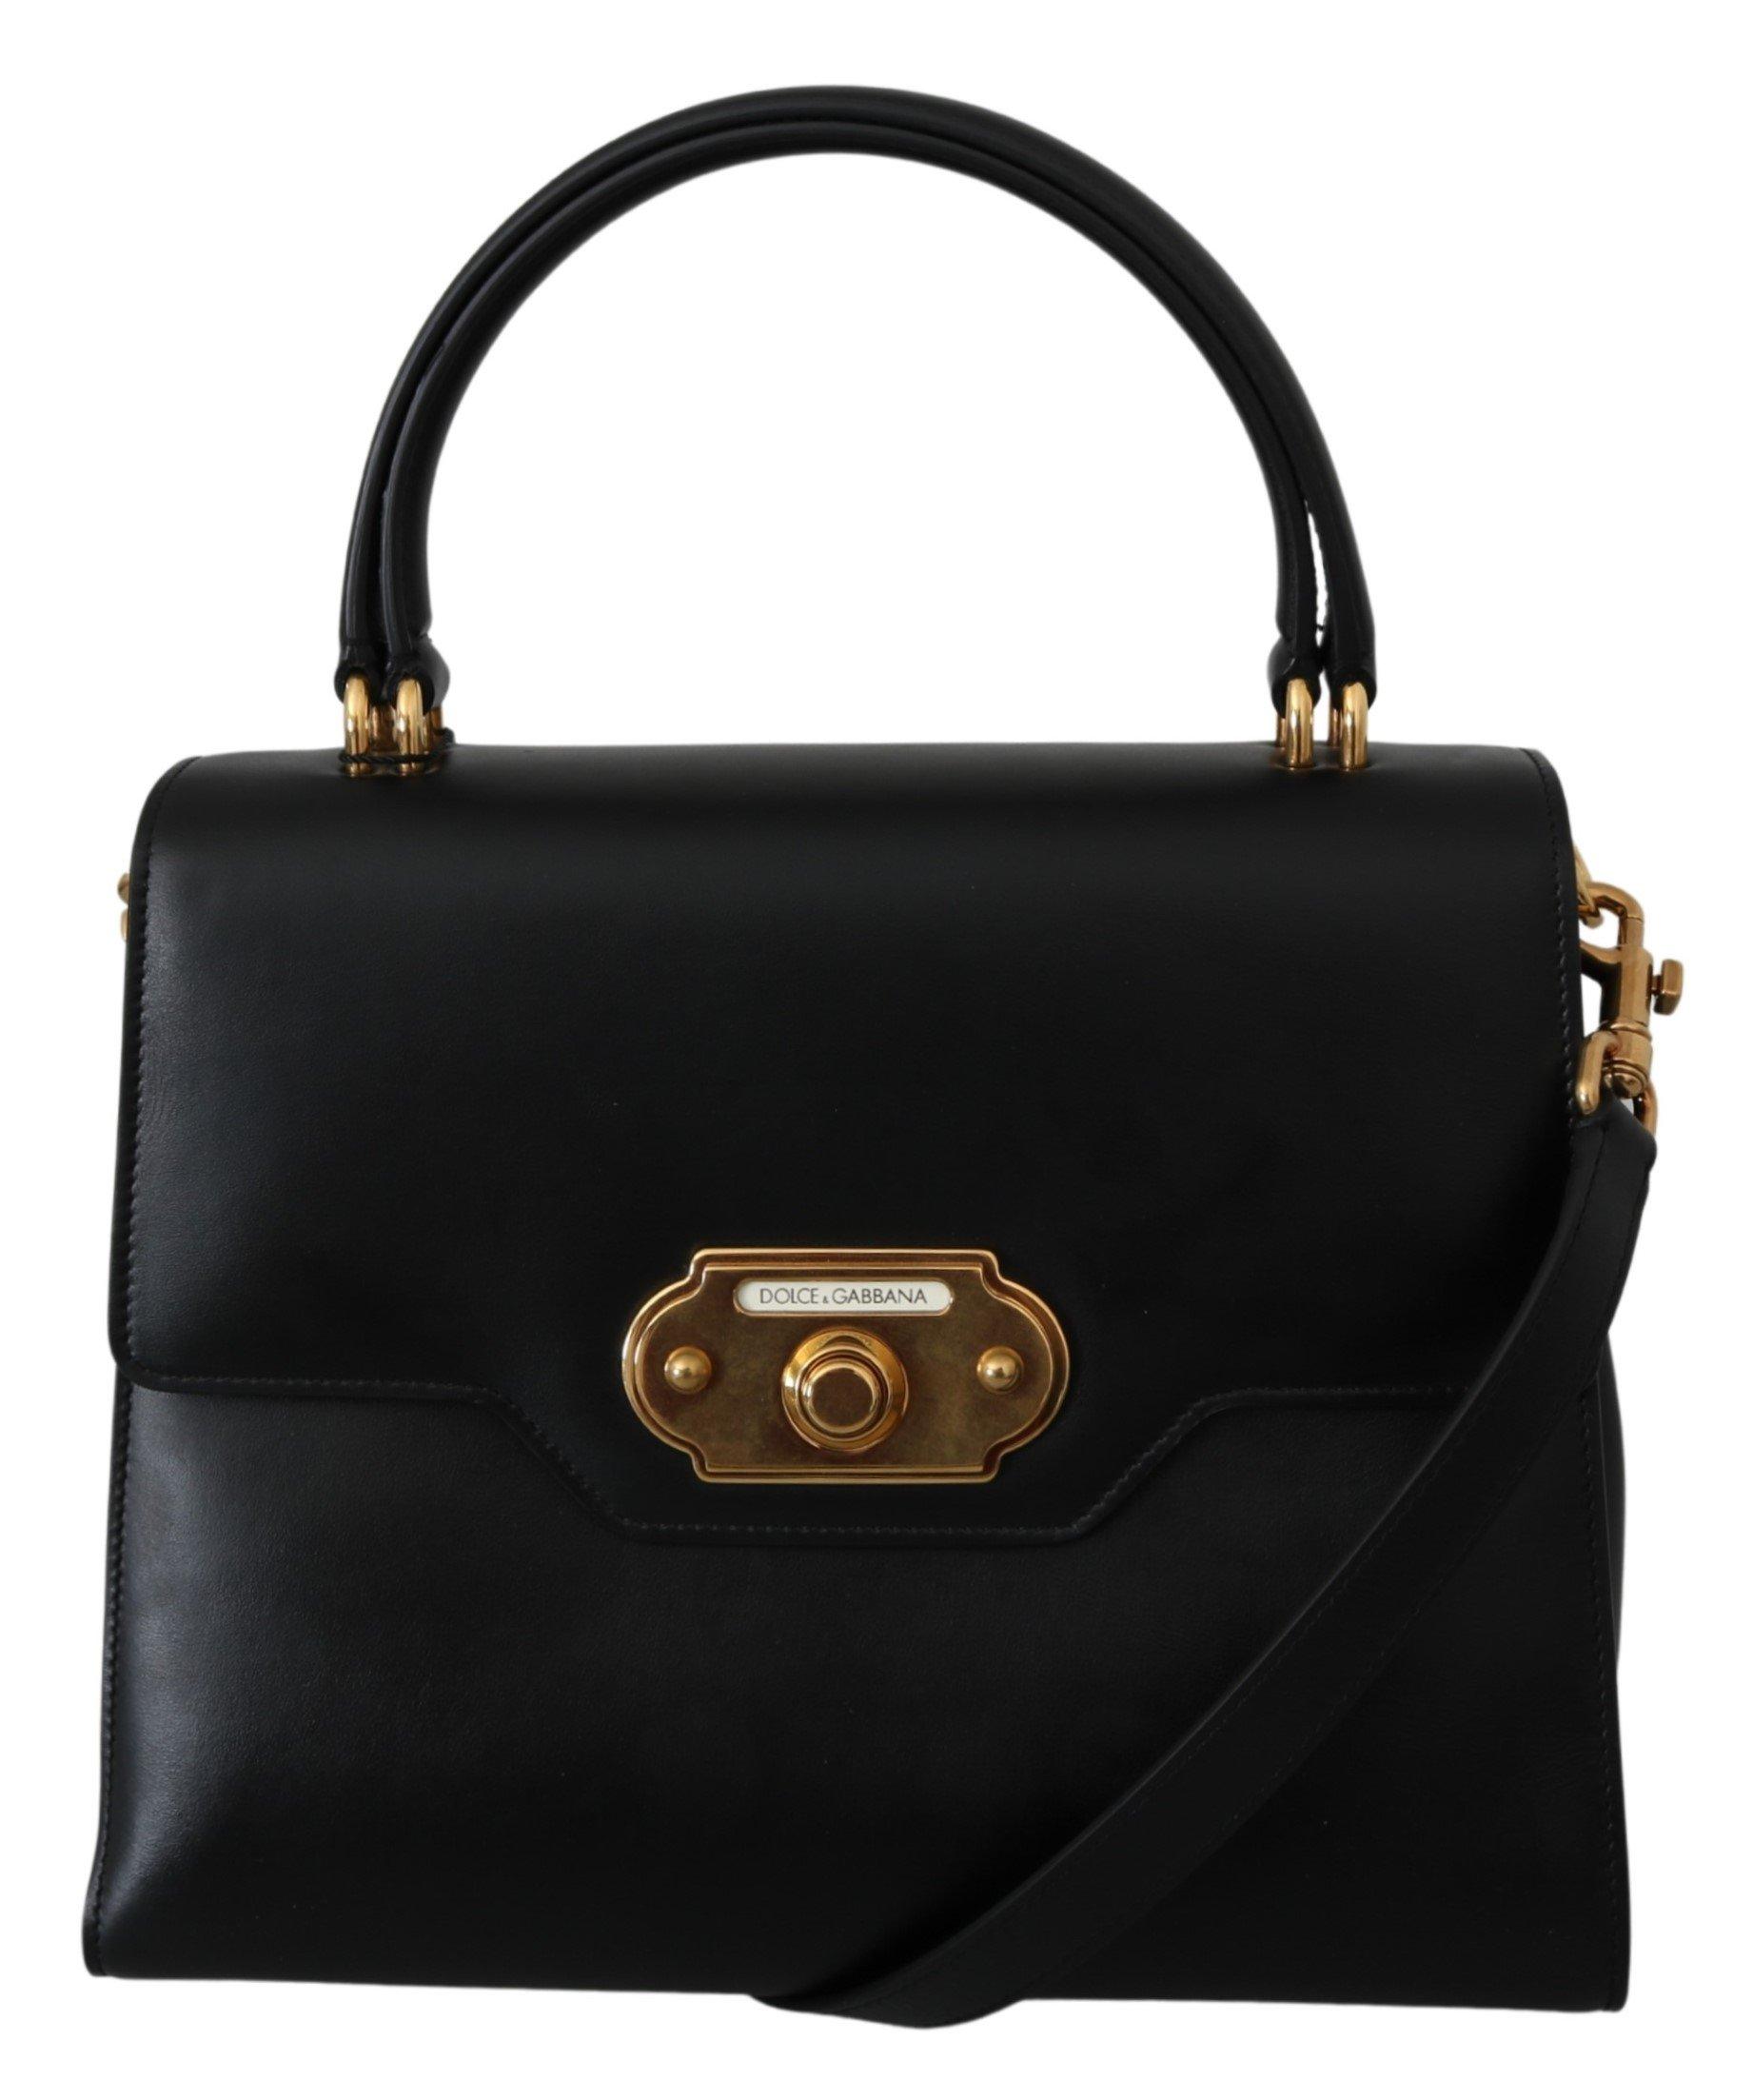 Dolce & Gabbana Women's Leather WELCOME Crossbody Bag Black VAS9959